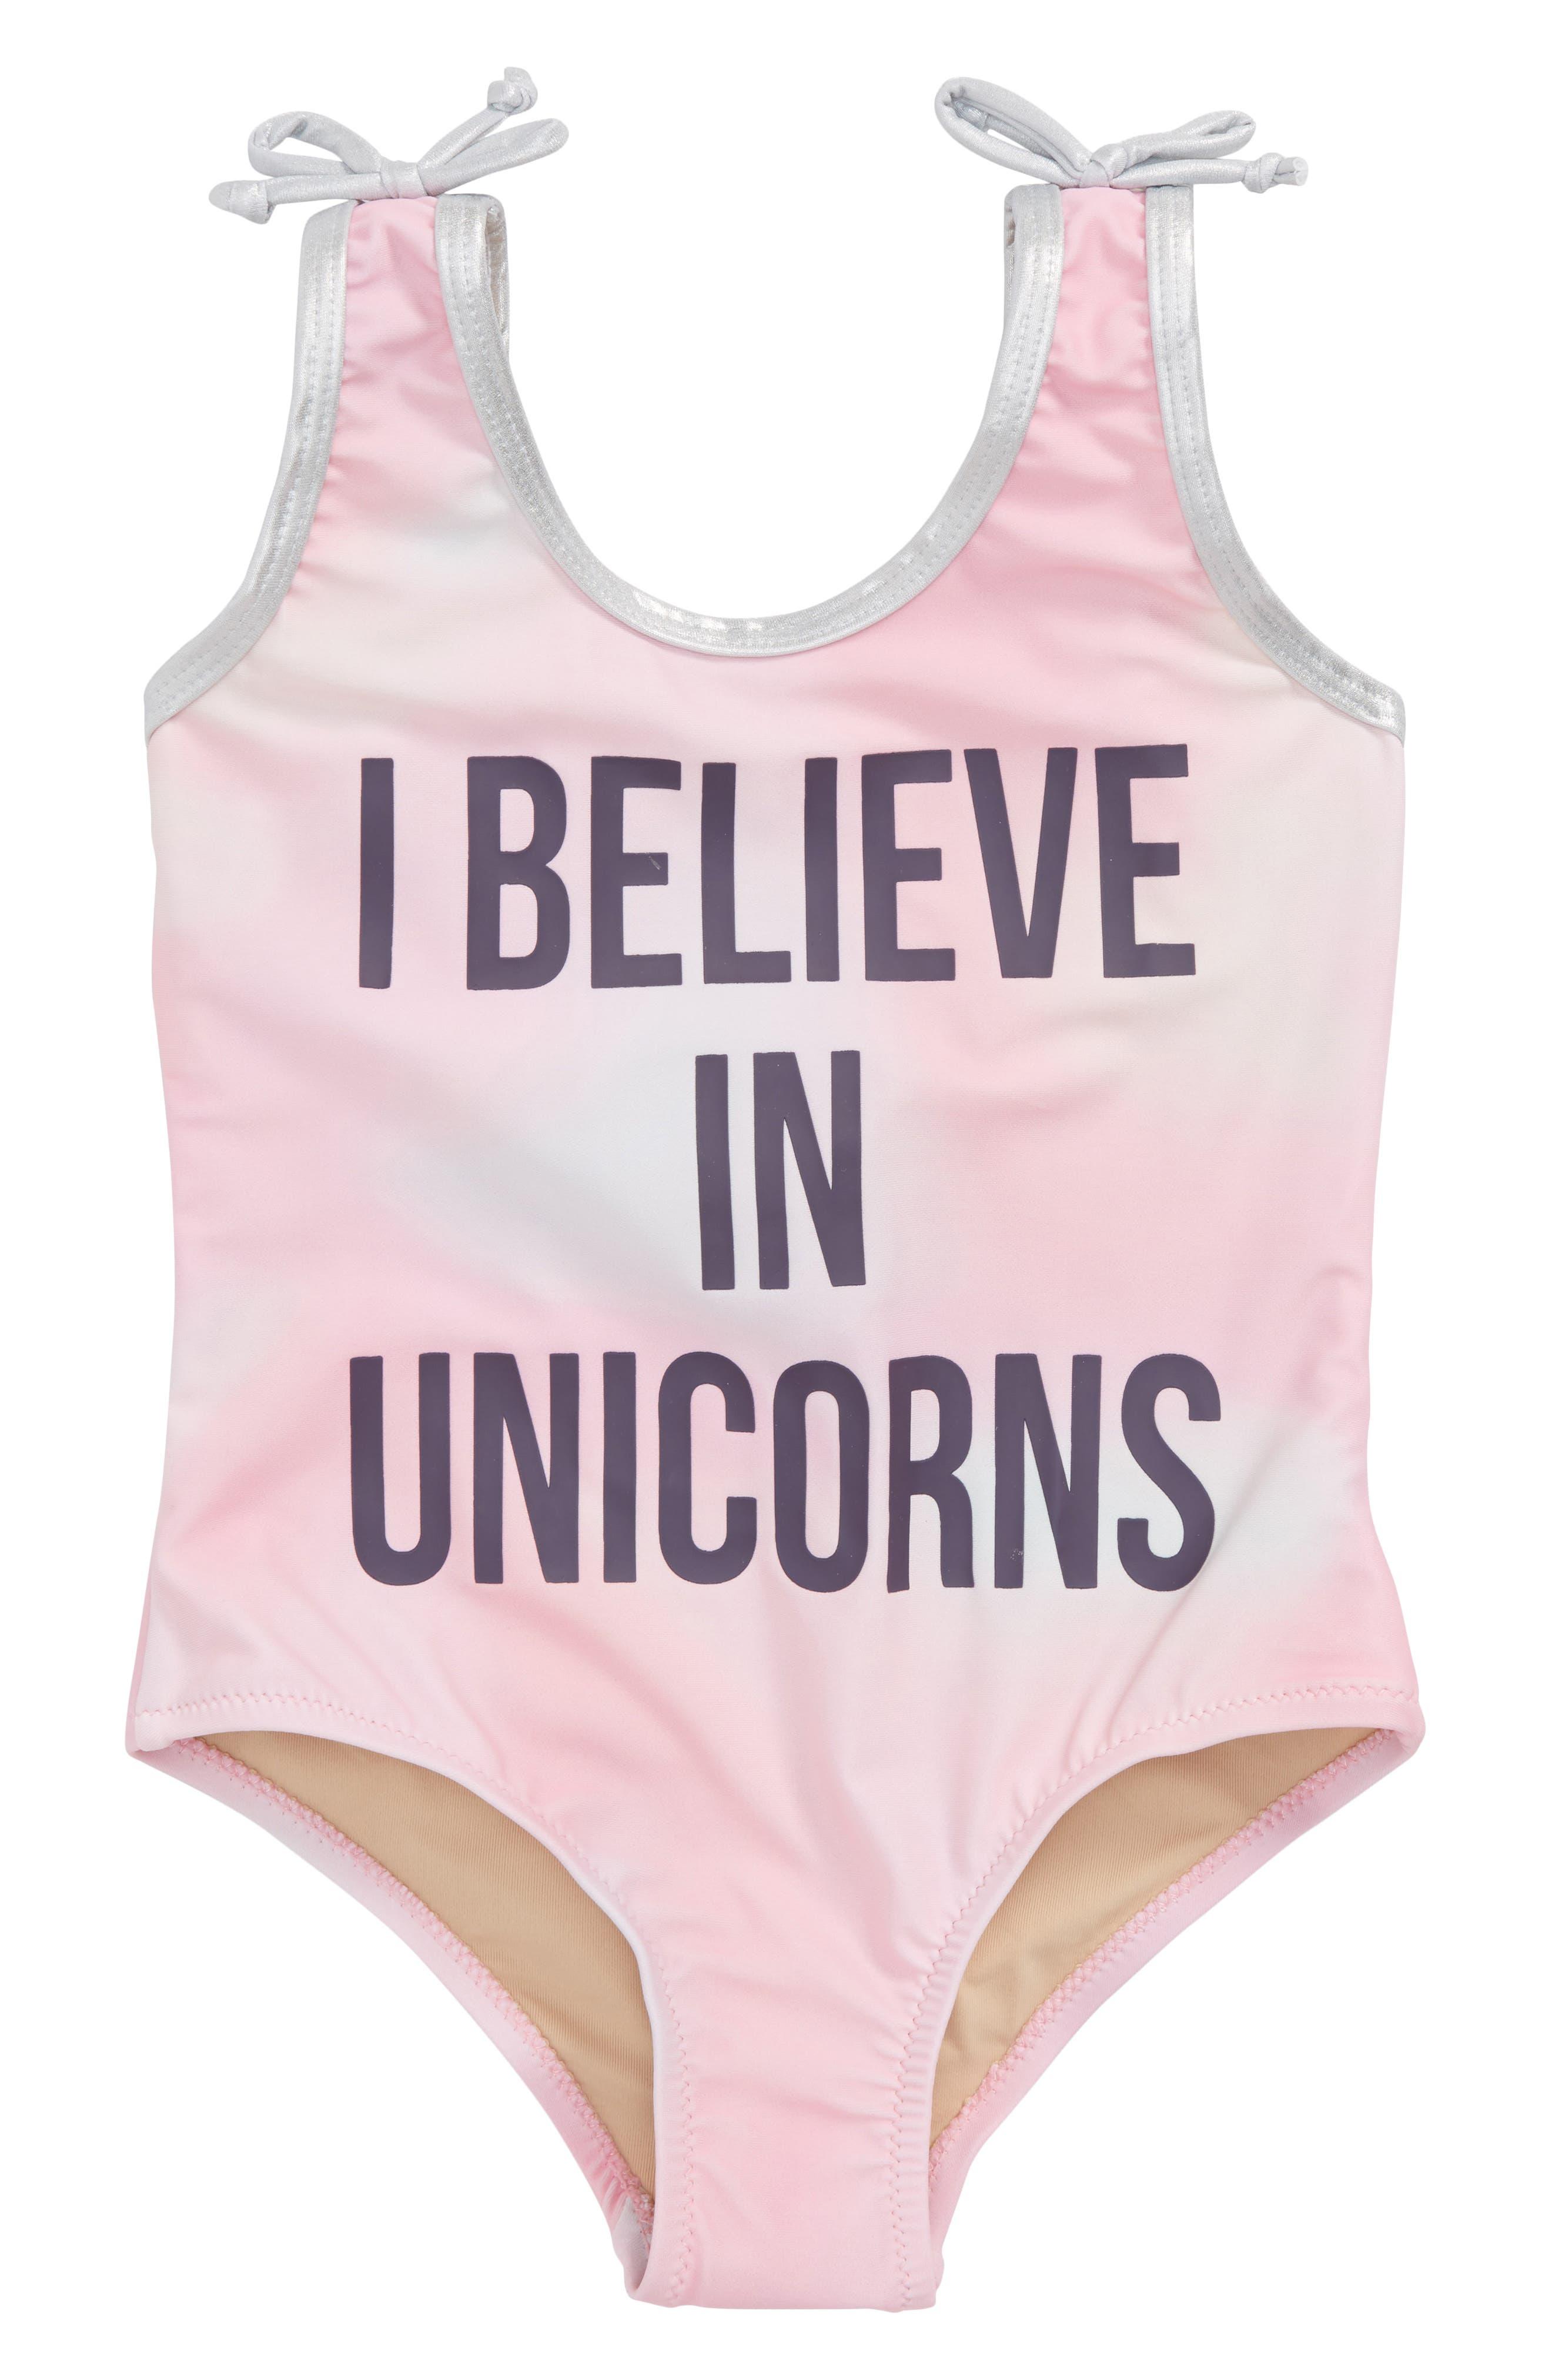 I Believe in Unicorns Tie Dye One-Piece Swimsuit,                         Main,                         color, 650